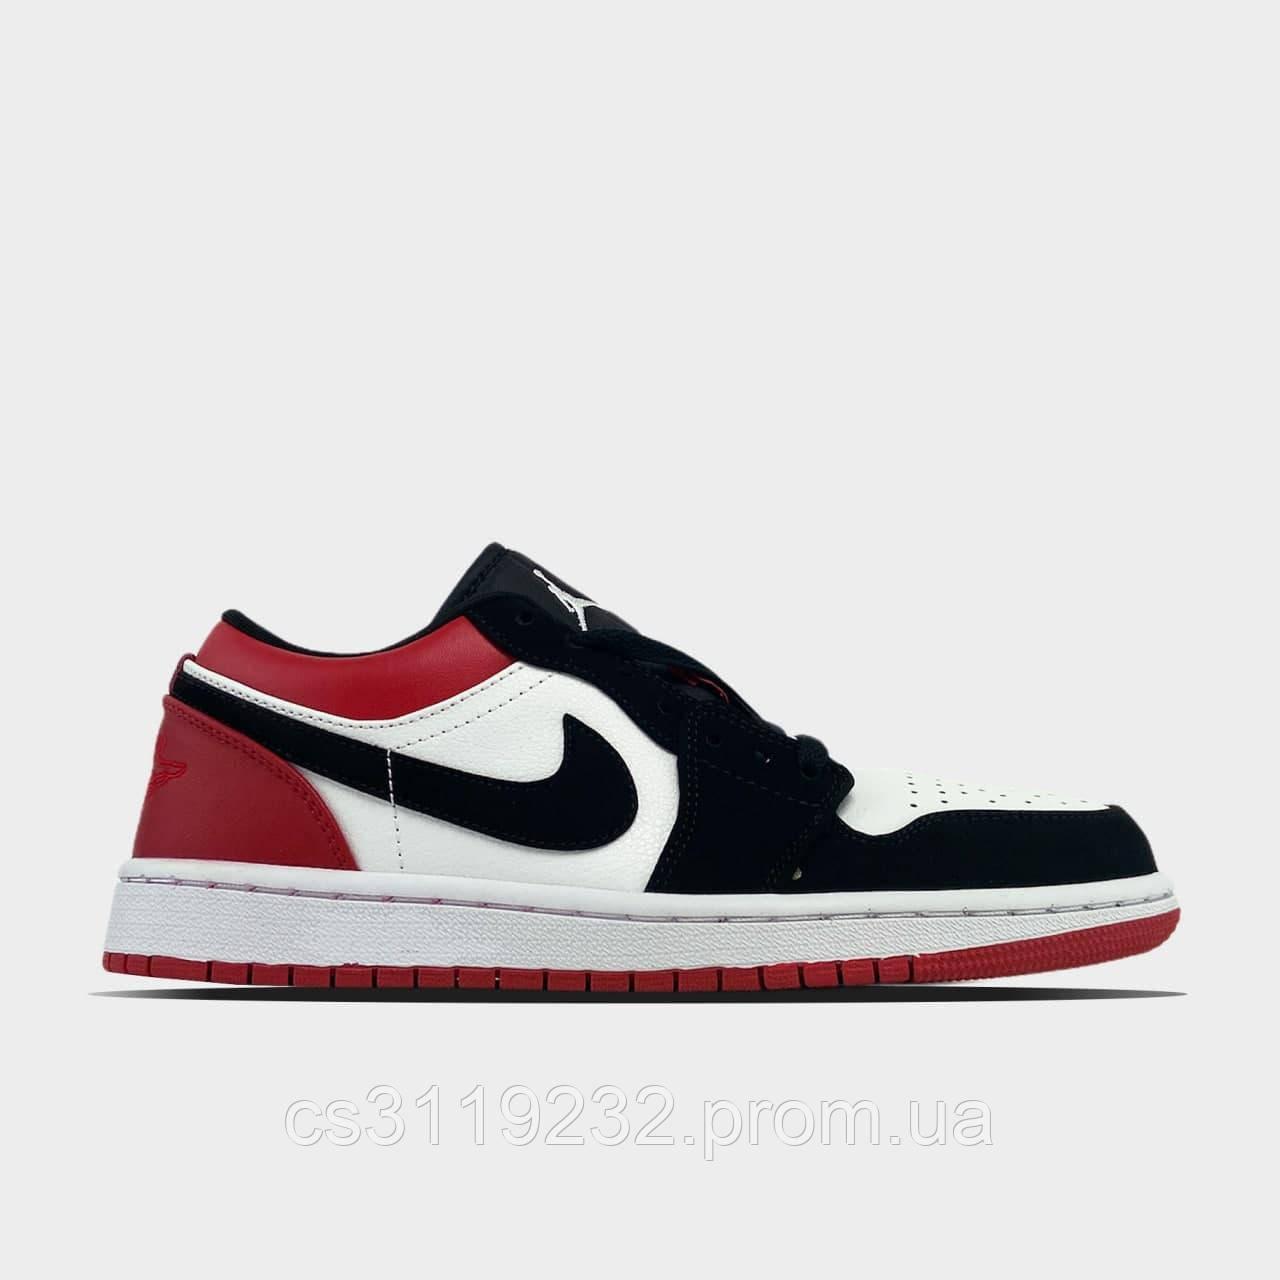 Мужские кроссовки Nike  Air Jordan 1 Low Red White(красный)